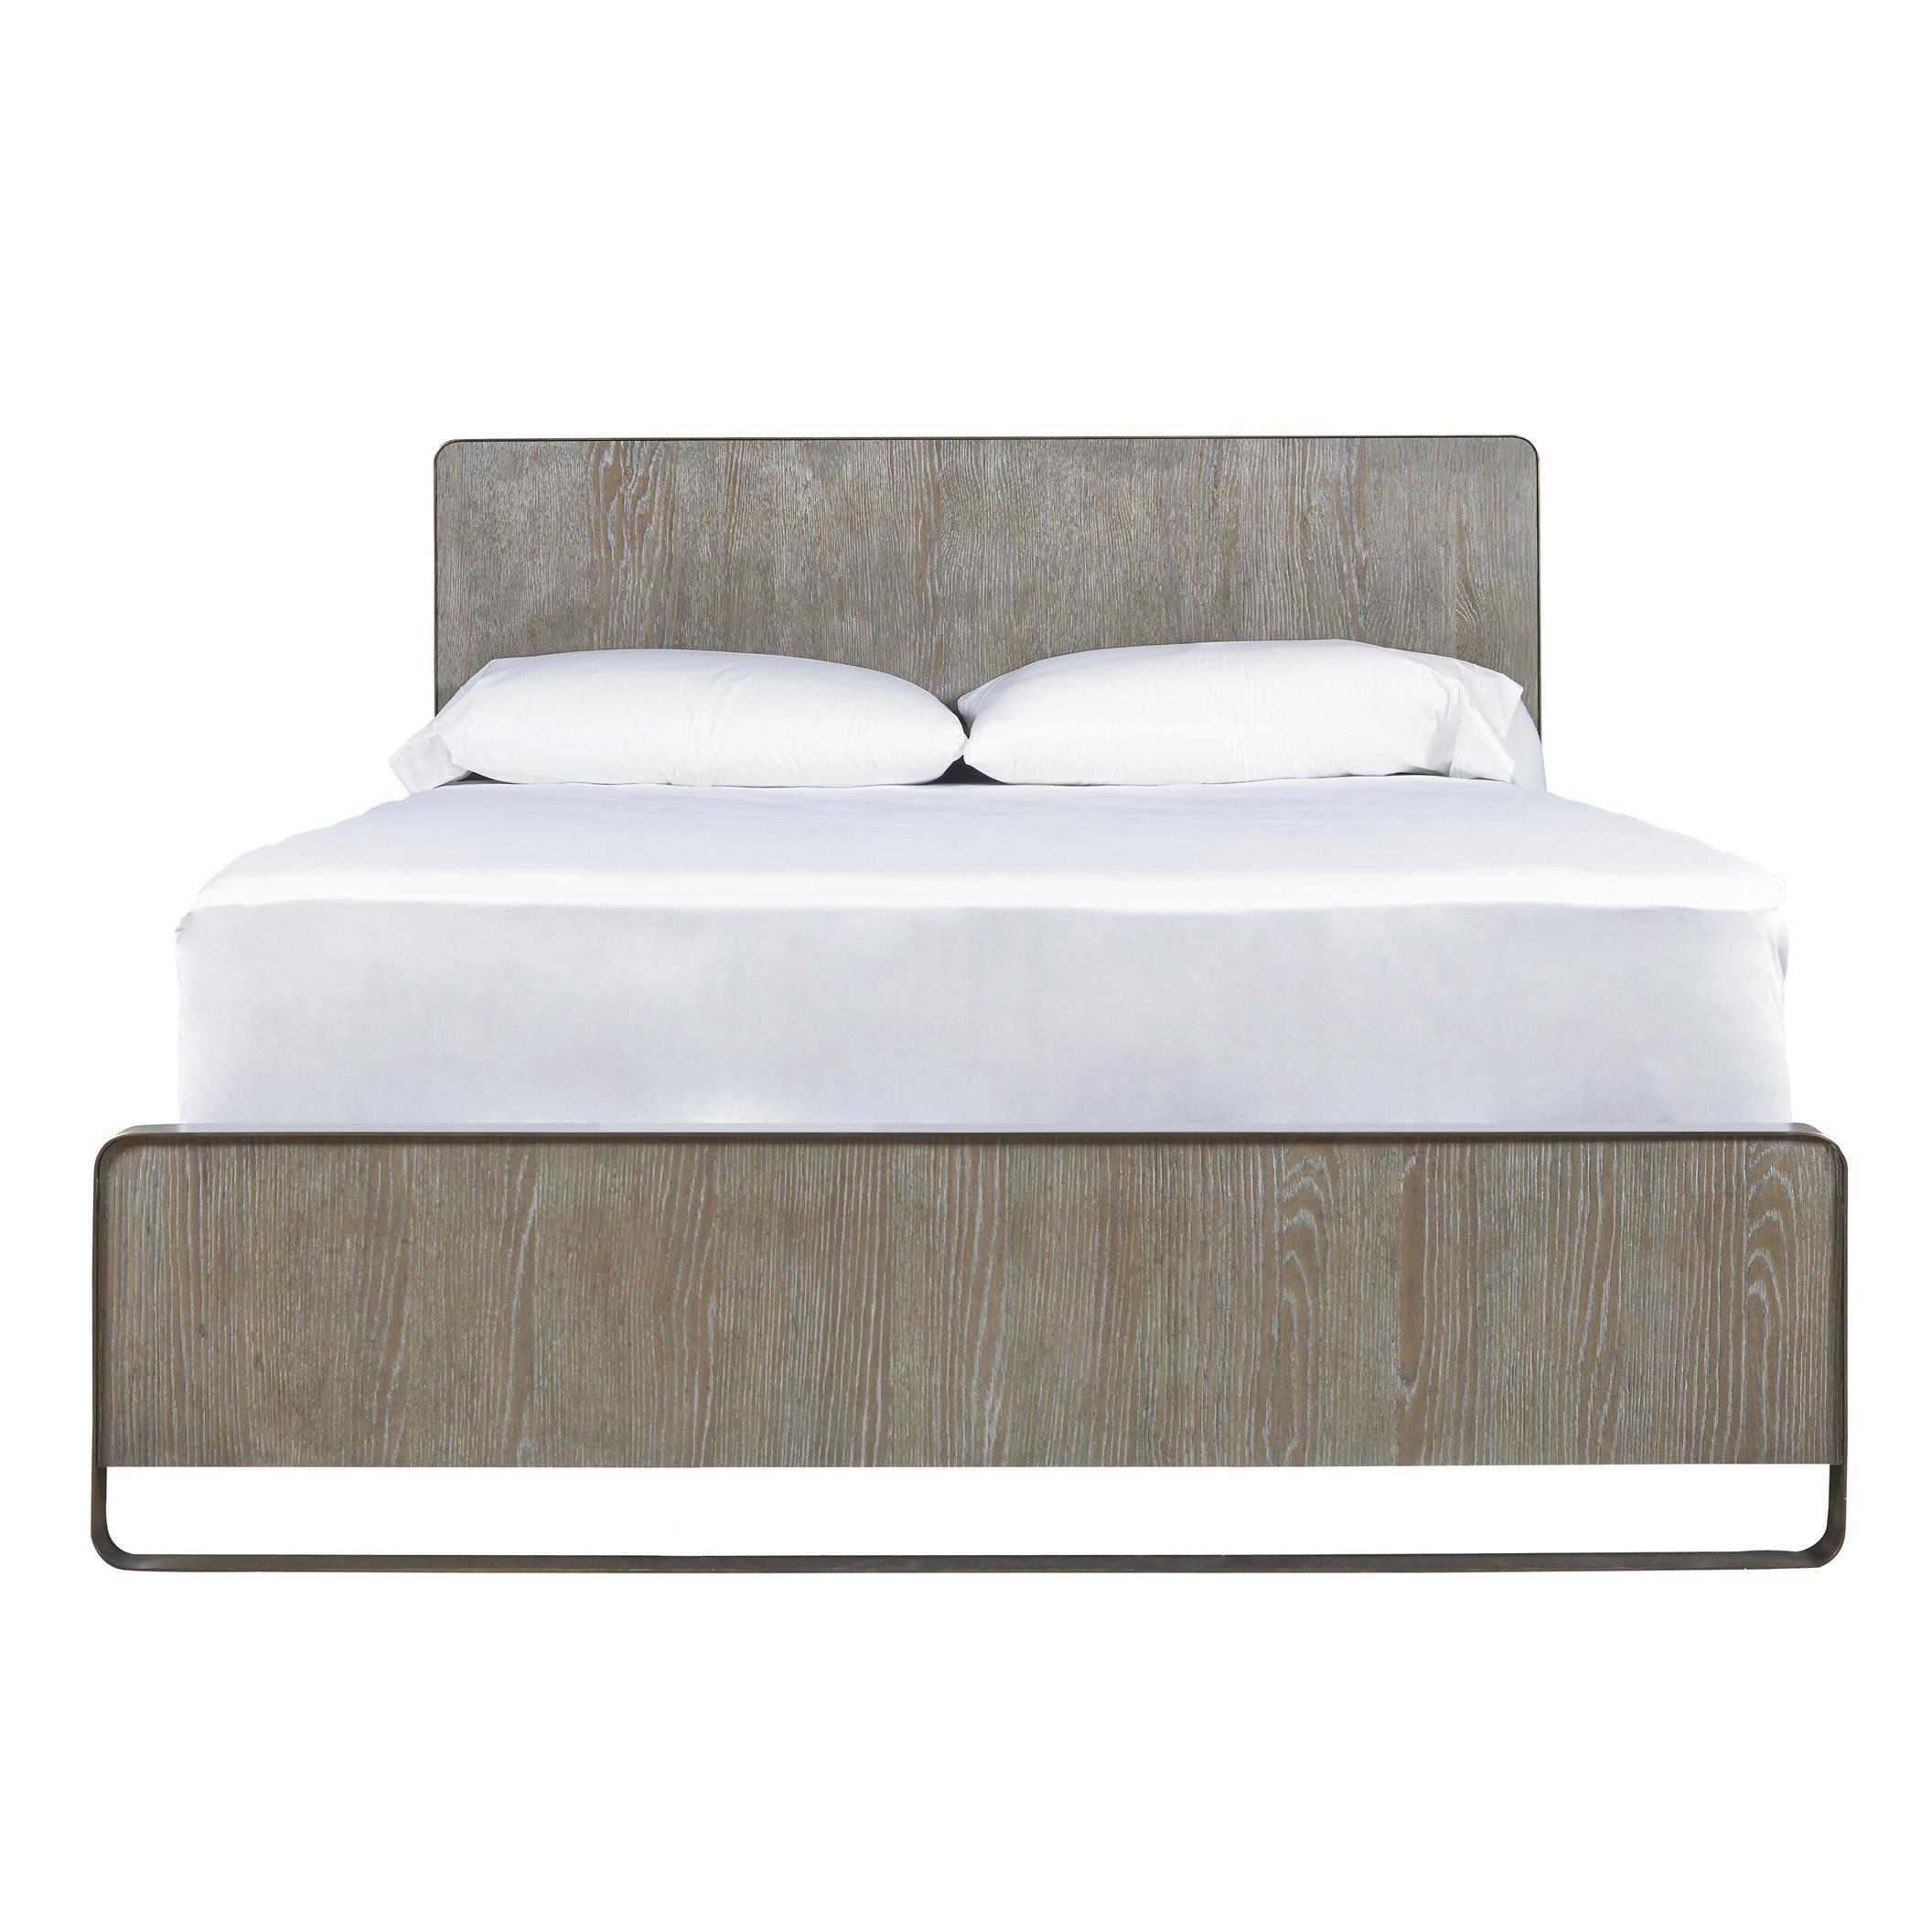 MODERN KEATON BED (KING).jpg